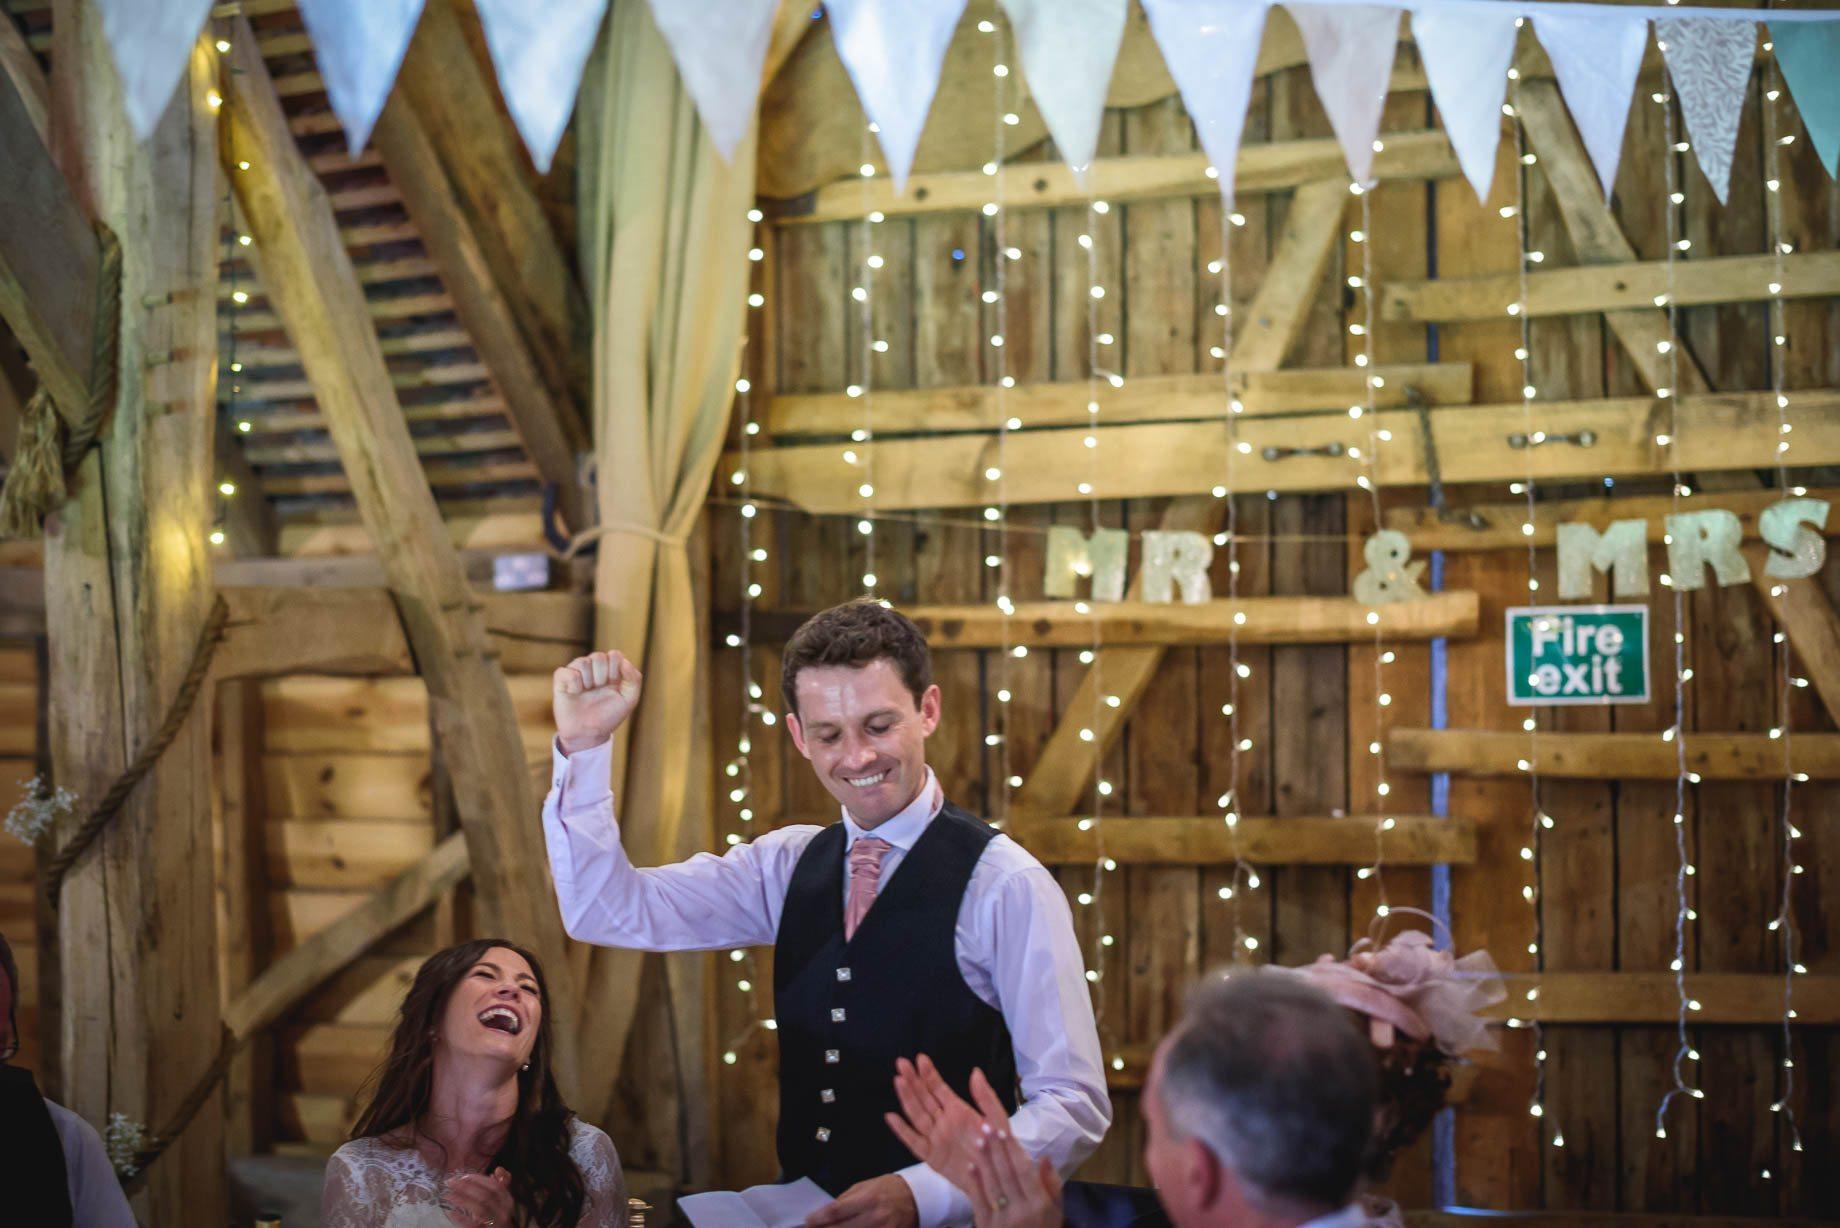 Gildings Barn wedding photography - Sarah and Steve (137 of 190)